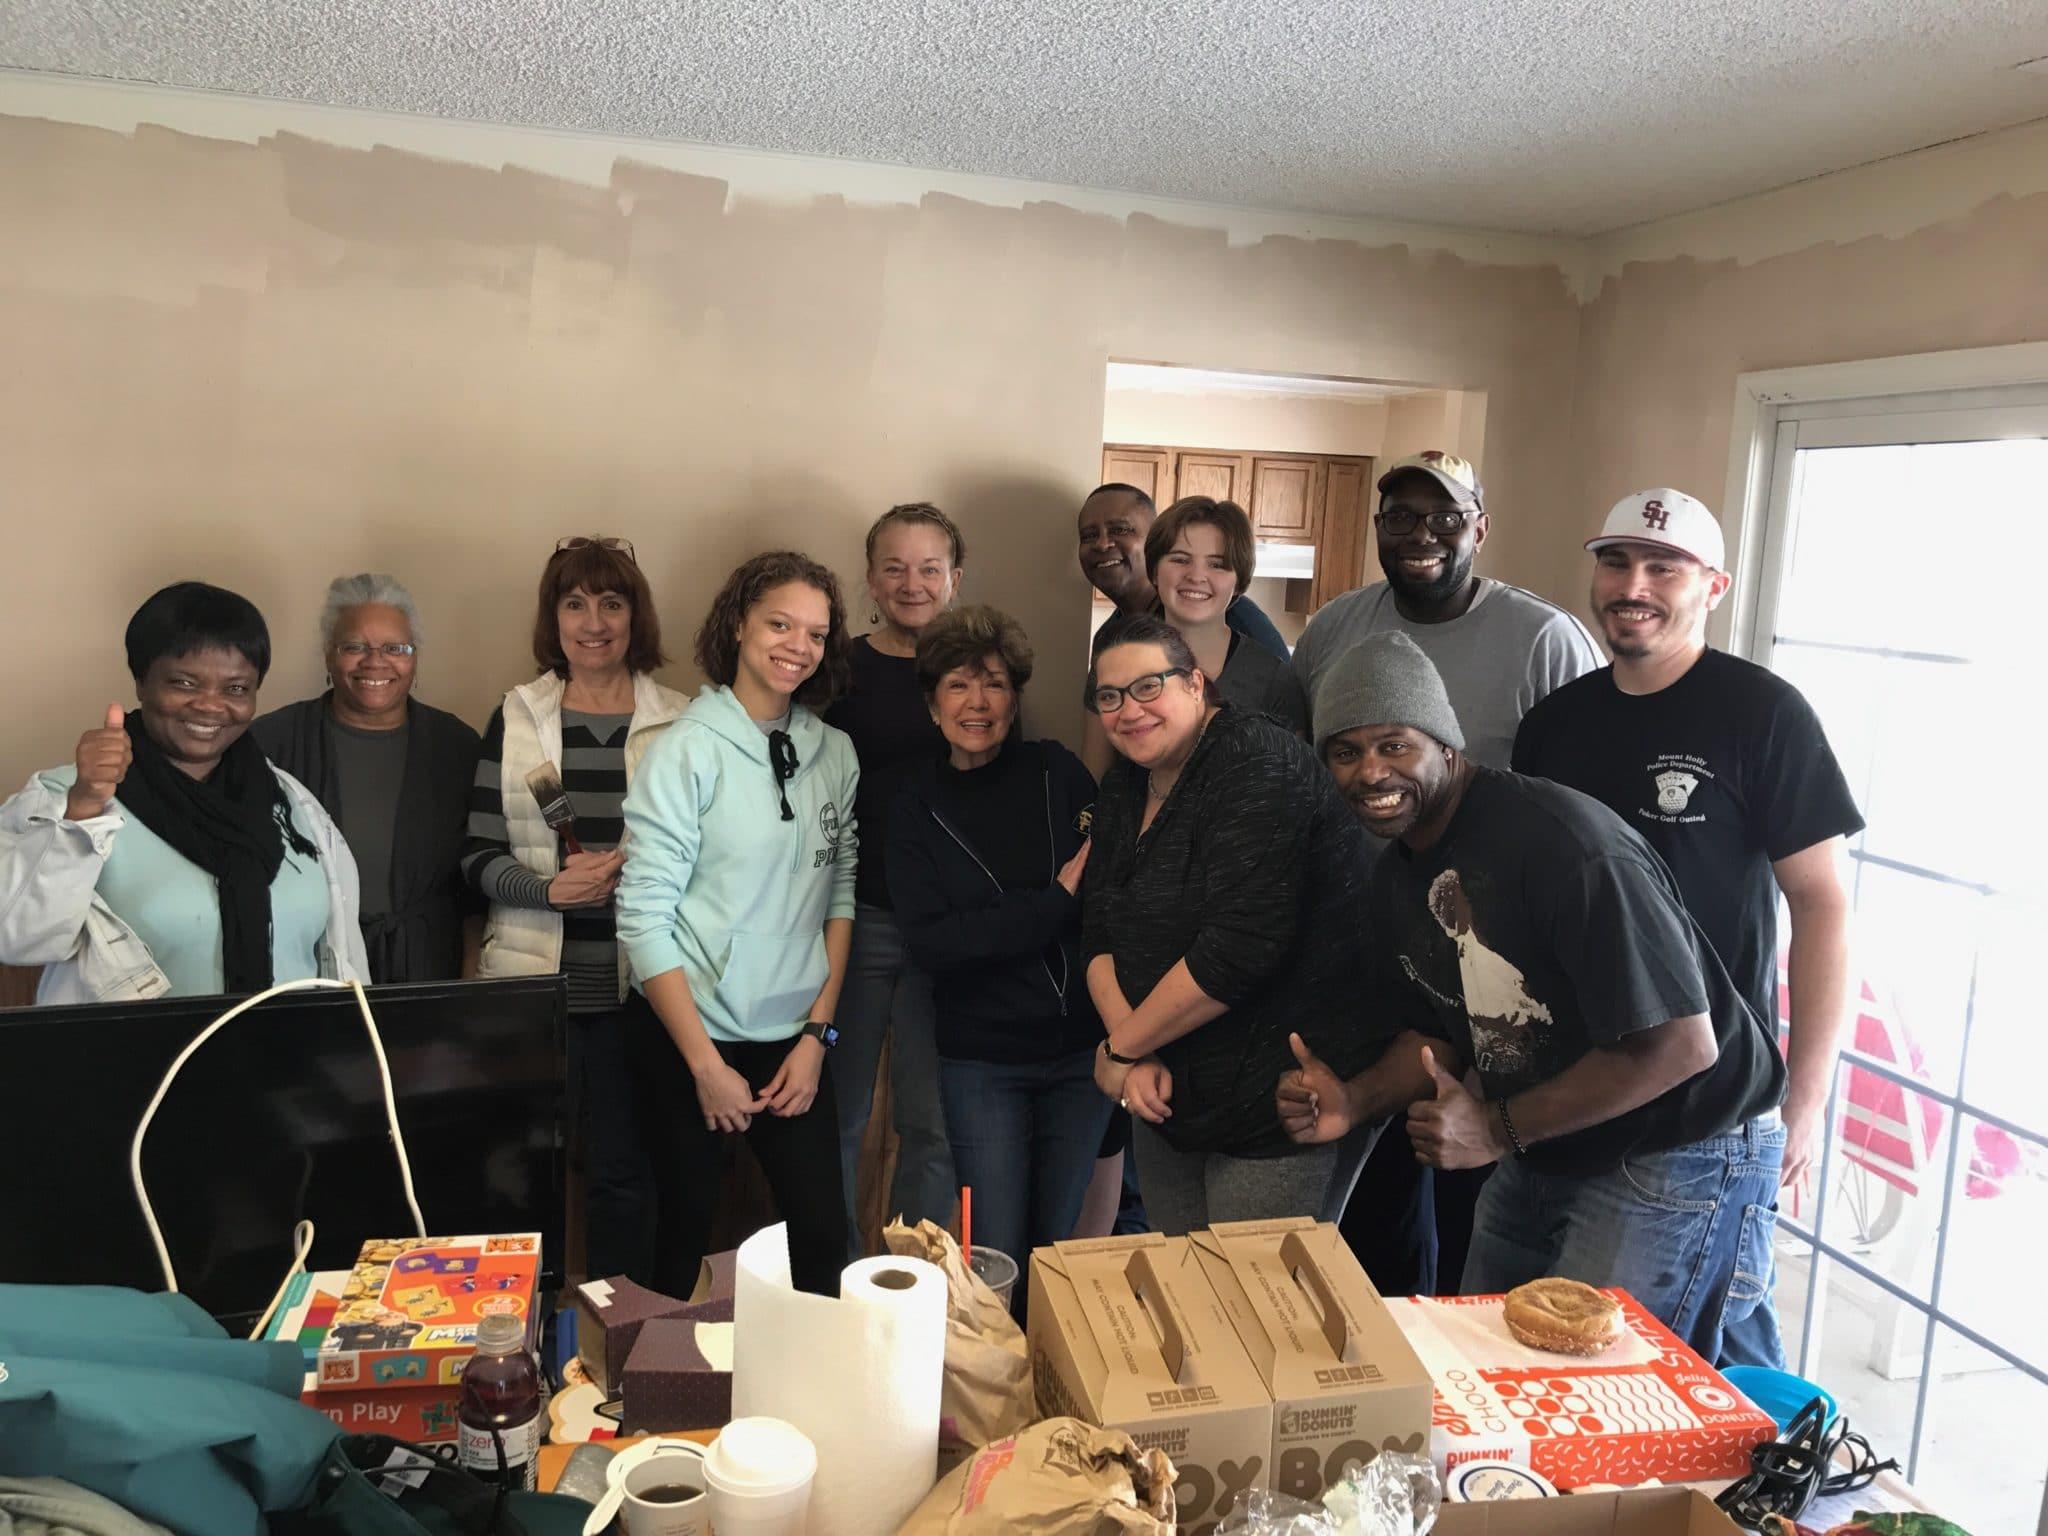 NJ Senator Troy Singleton to Lead Team of Volunteers in Restoring Homes for Community Options